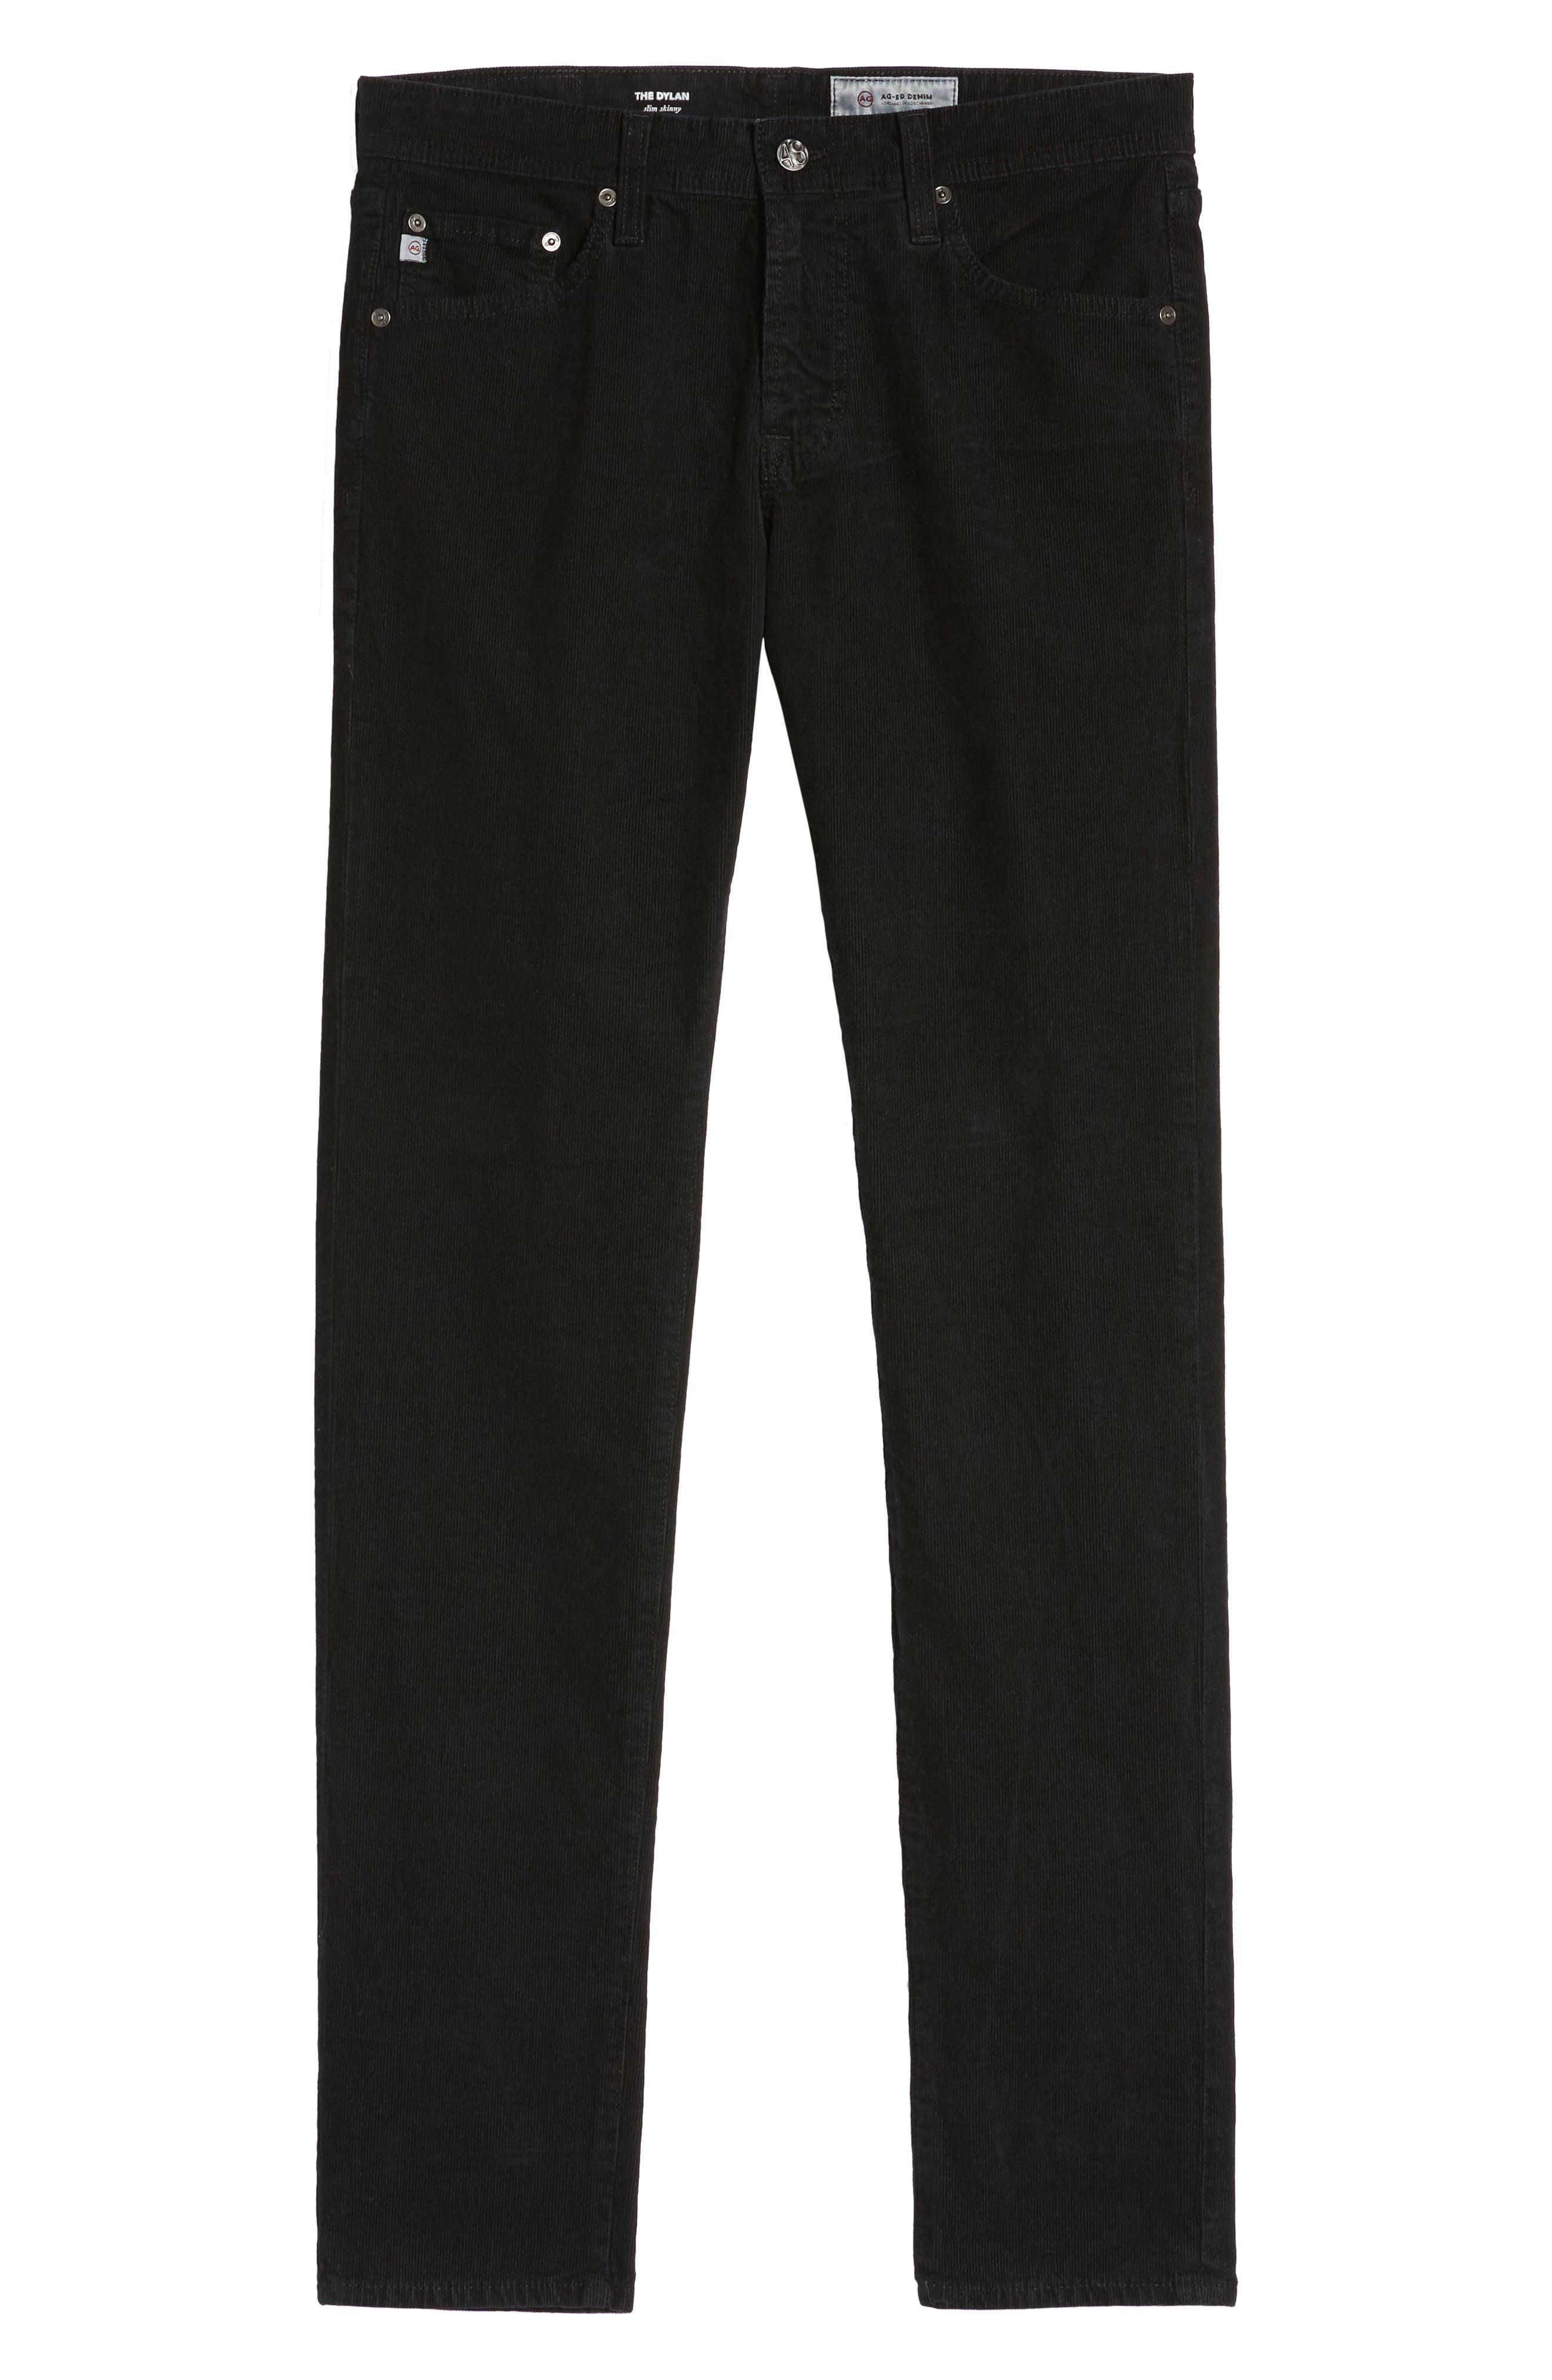 Dylan Skinny Fit Corduroy Pants,                             Alternate thumbnail 6, color,                             Sulfur True Black